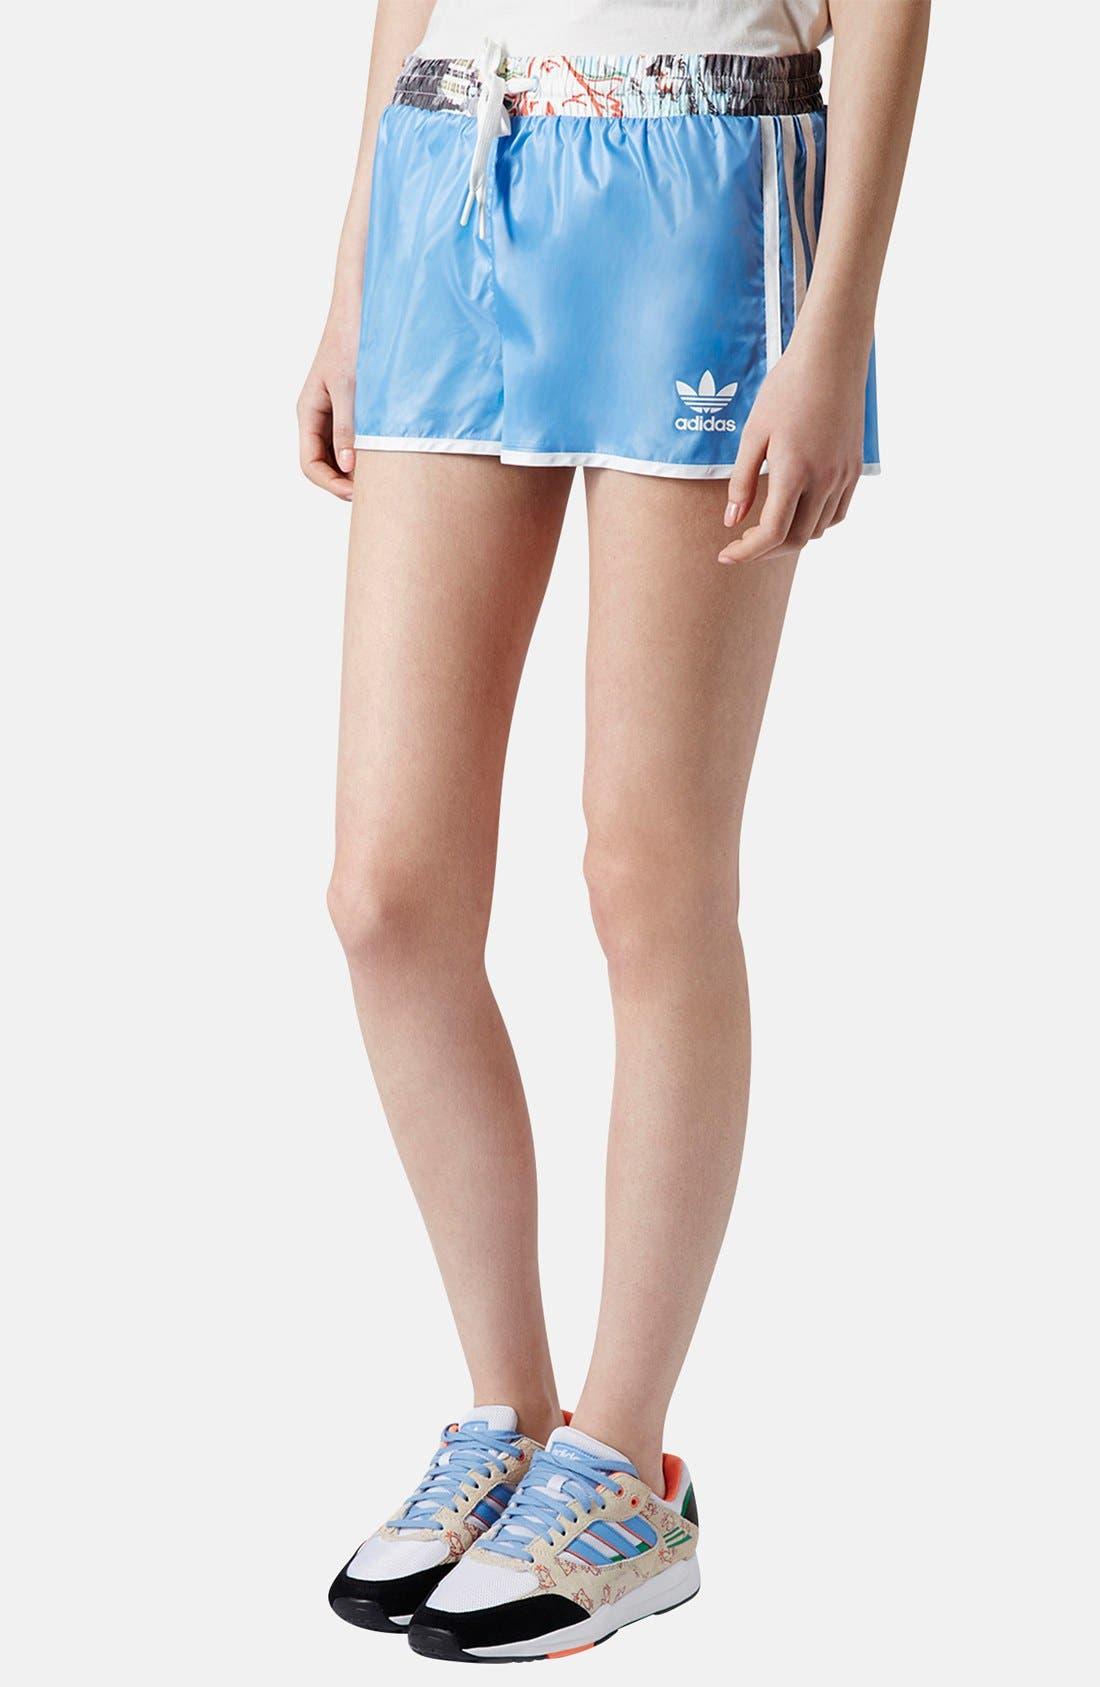 Main Image - Topshop x adidas Originals Blue Shorts